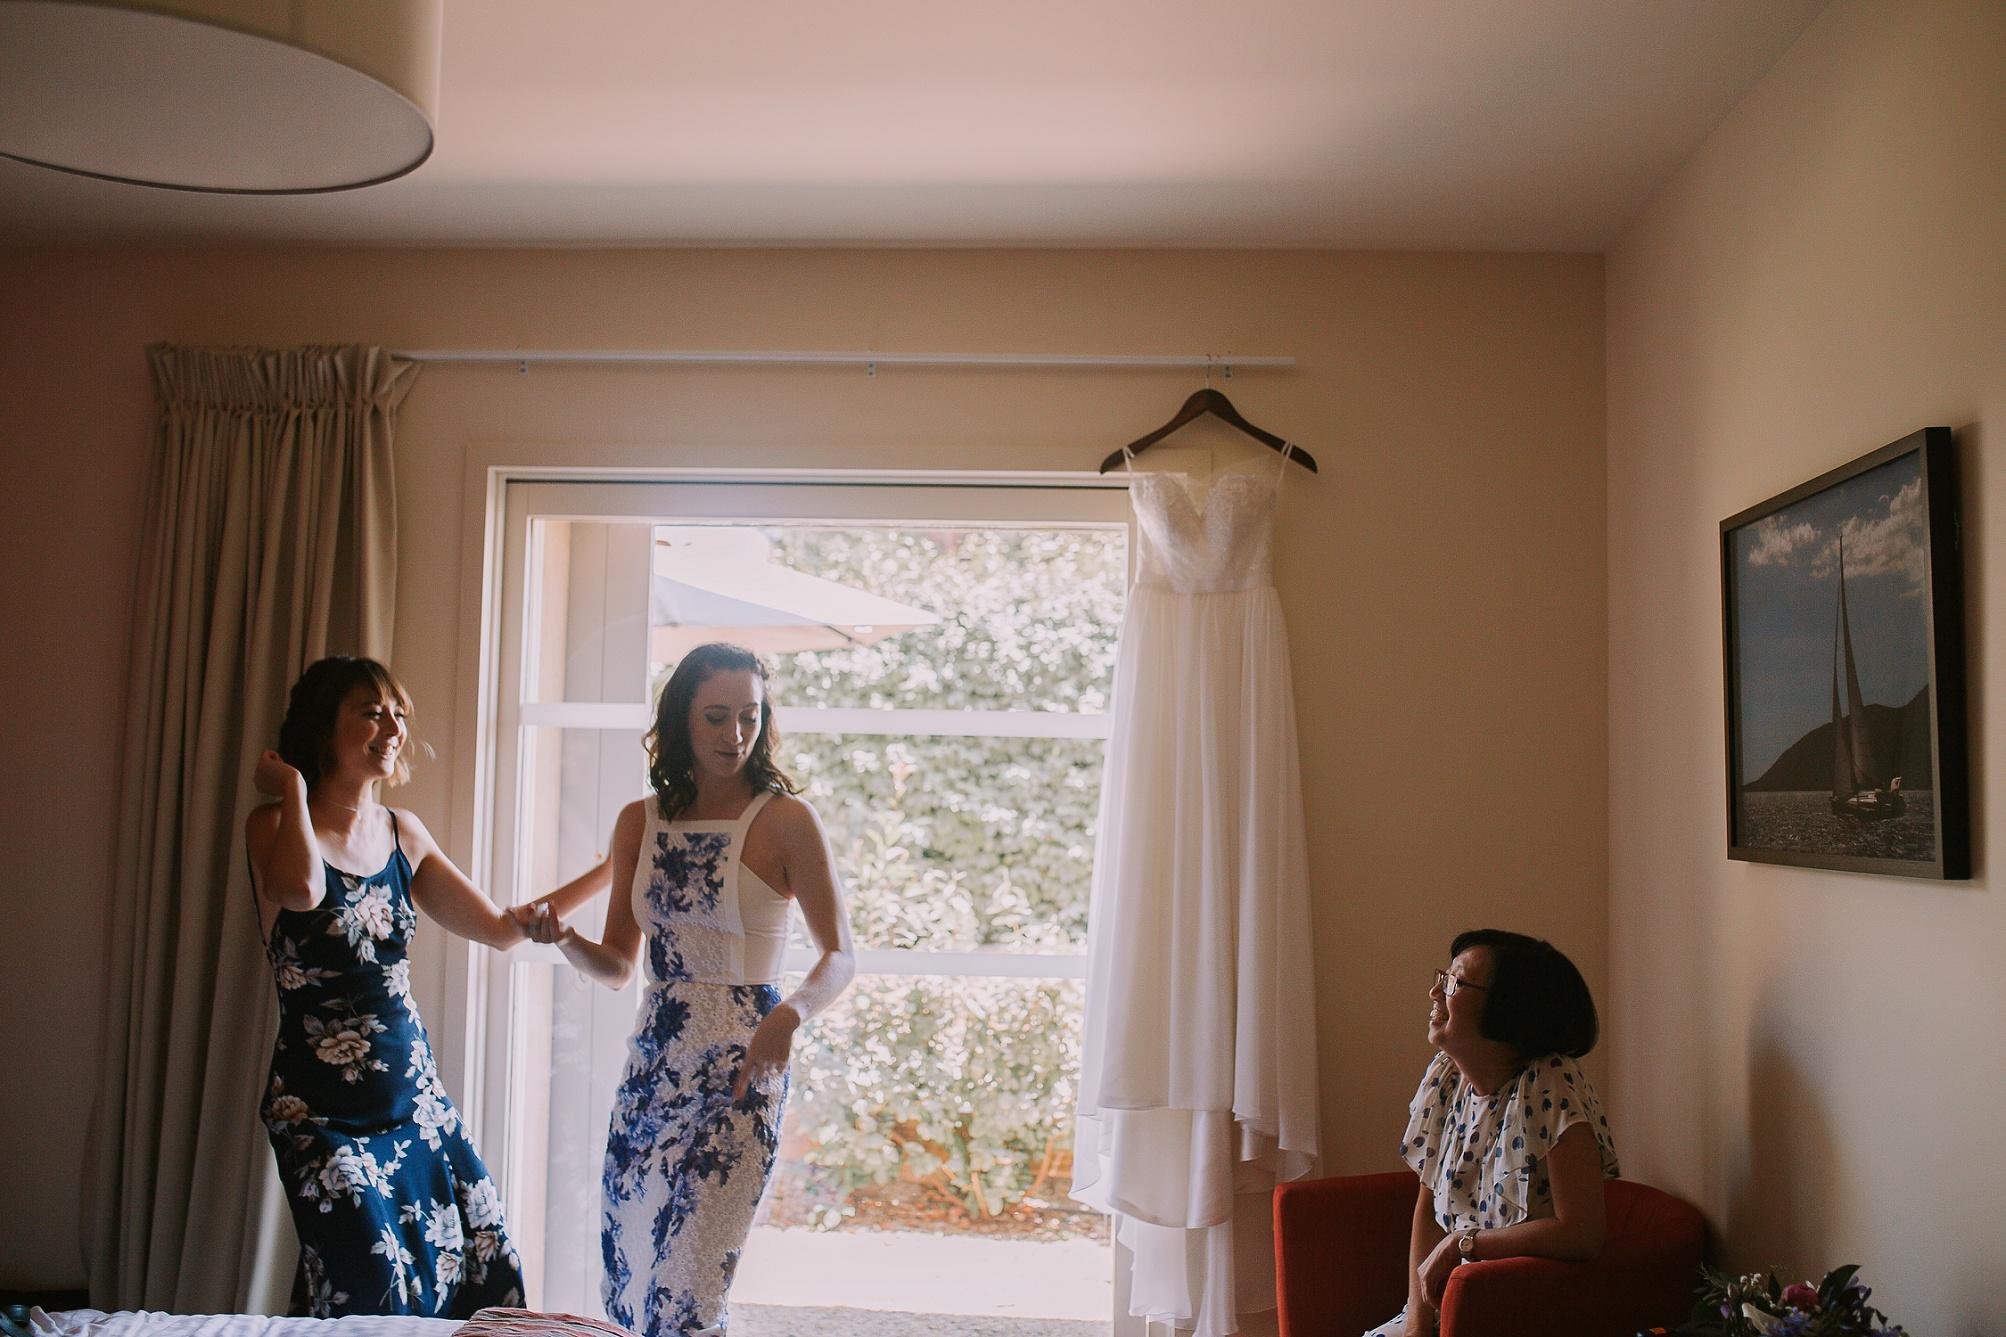 katerynaphotos-mariage-photographe-puyloubier-provence-aix-en-provence-sud-de-la-france_0332.jpg